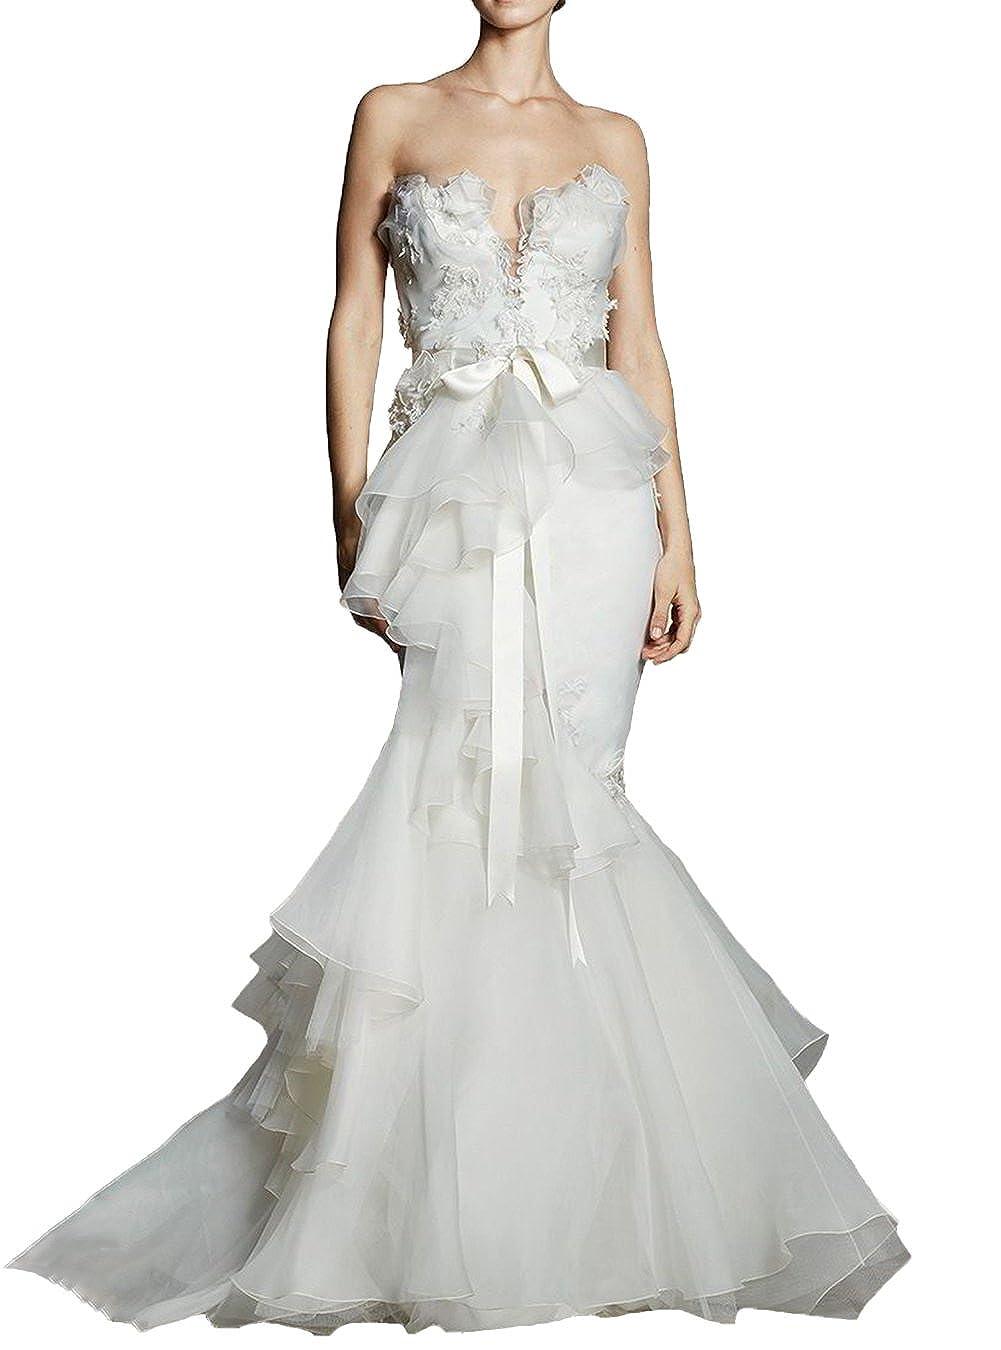 Ugly Strapless Elegant Mermaid Wedding Dress Sweetheart